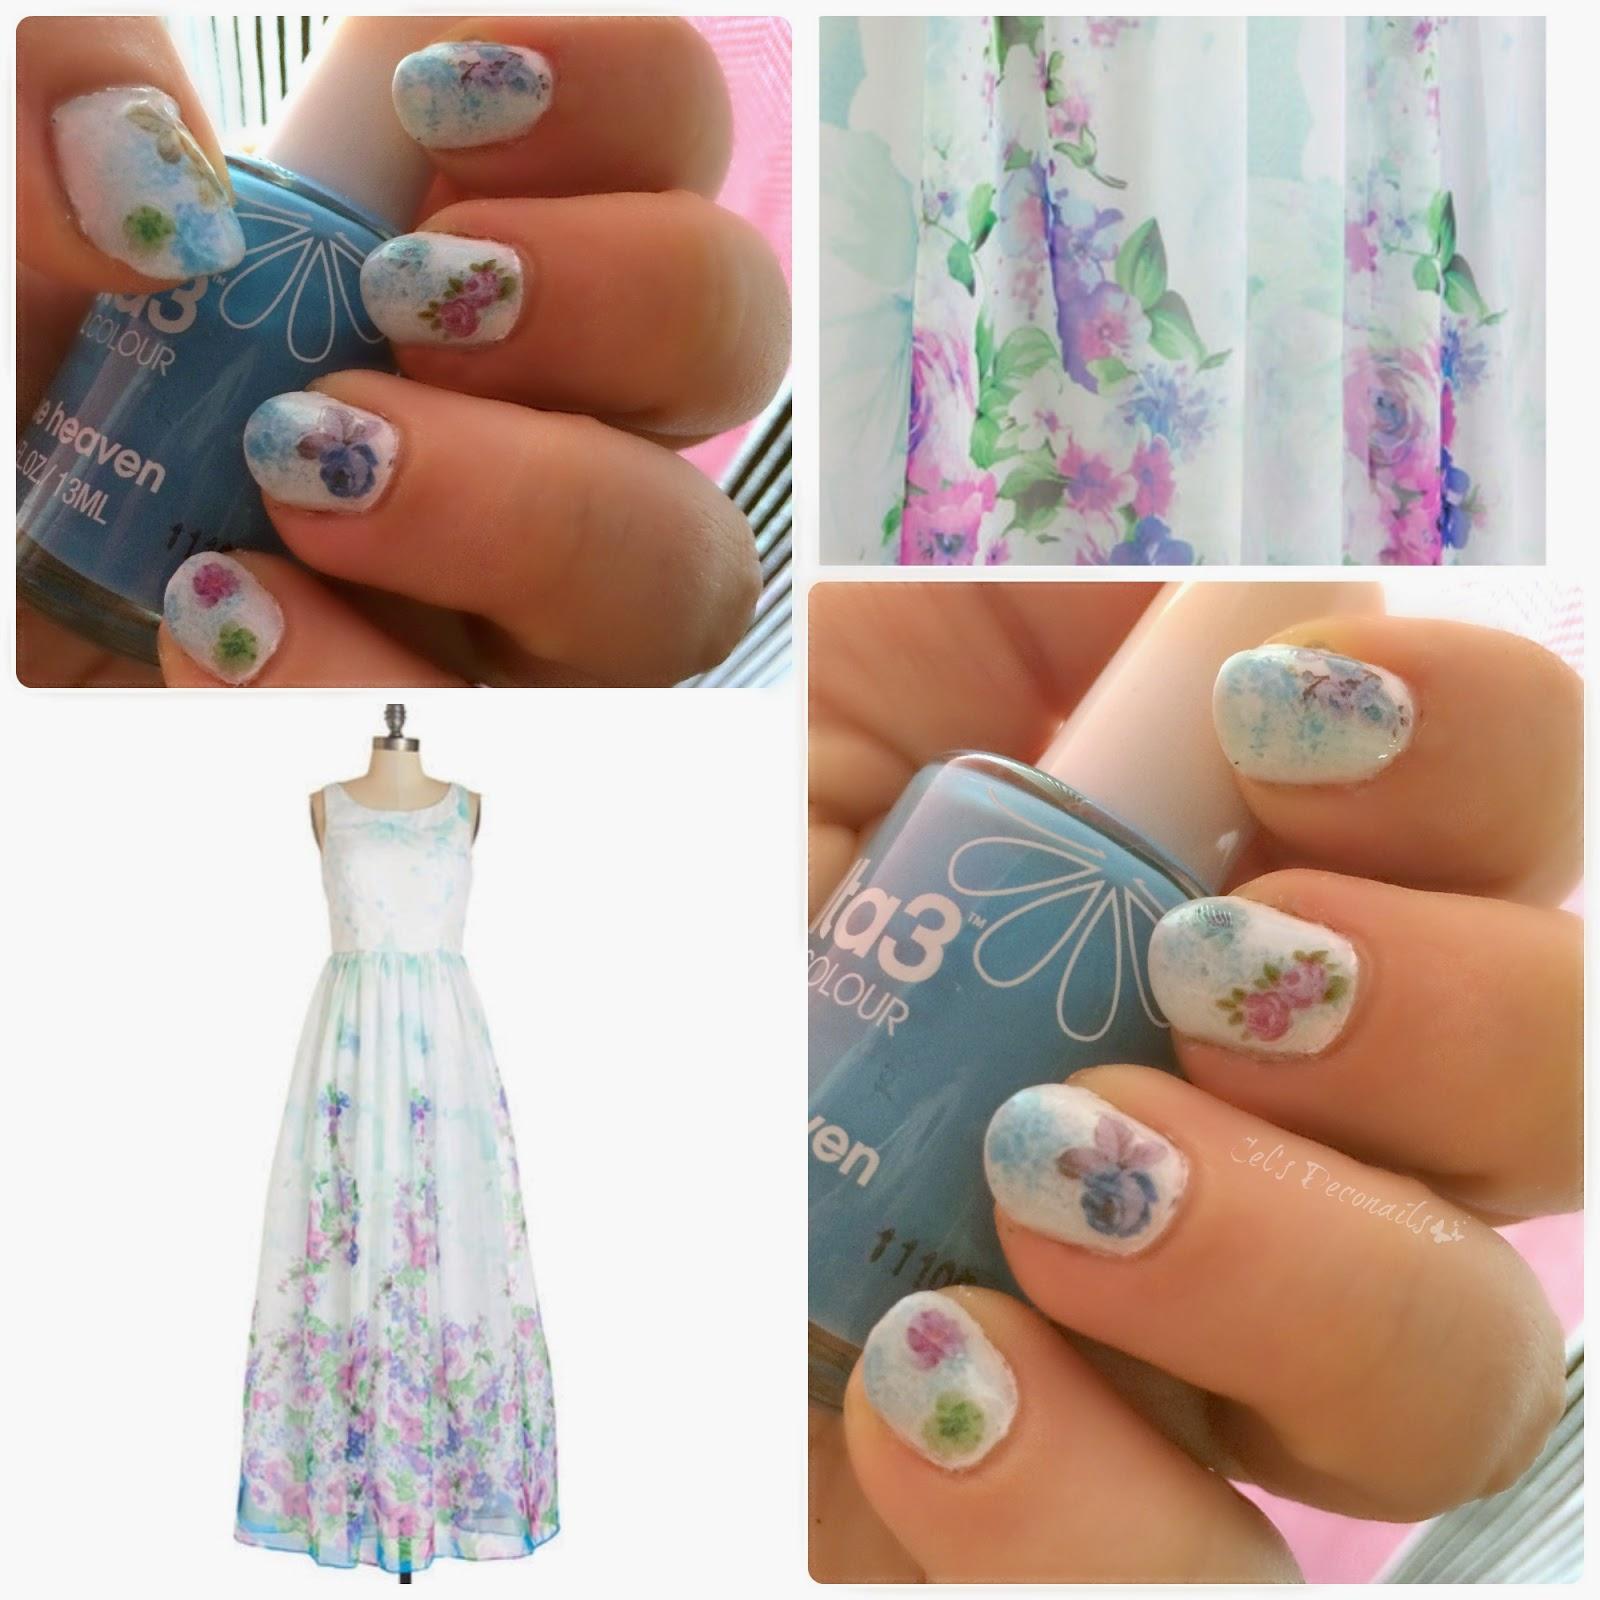 Cel\'s kawaii nail beauty and deco blog: July 2014